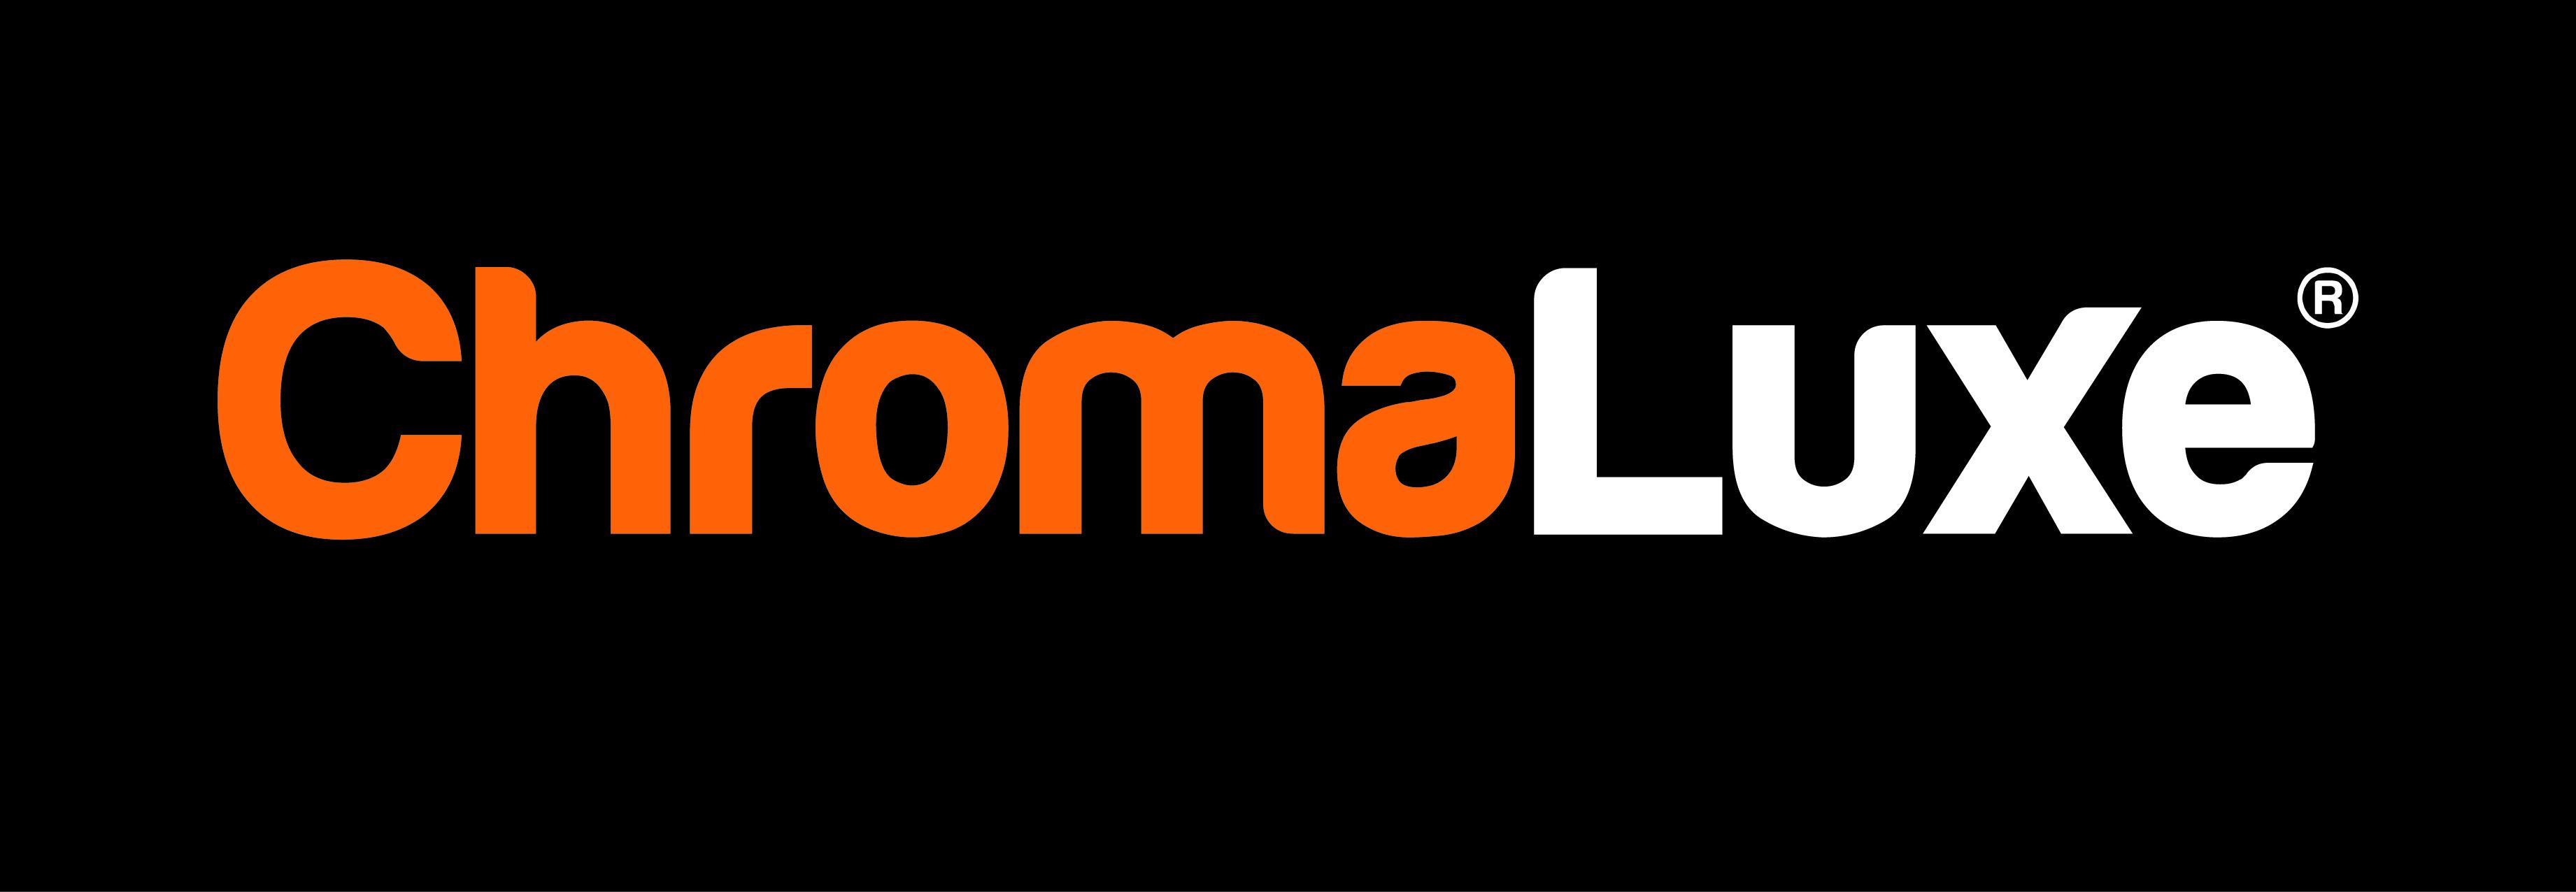 ChromaLuxe_OrangeWhite REV.jpg